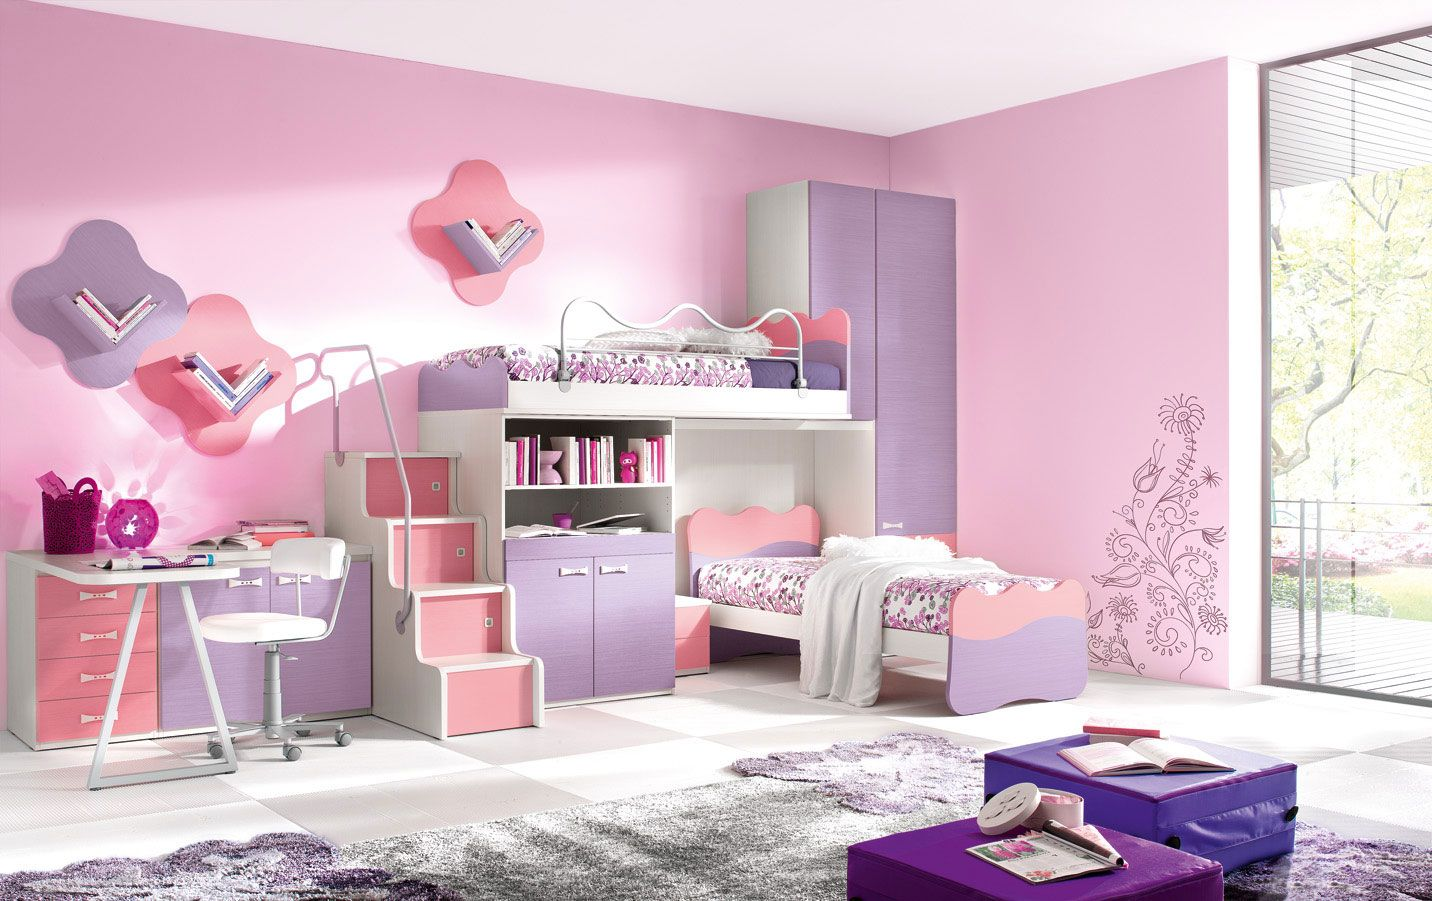 toddler furniture for girls | Bedroom design, Kids Bedroom ... on Beautiful Rooms For Girls  id=93664